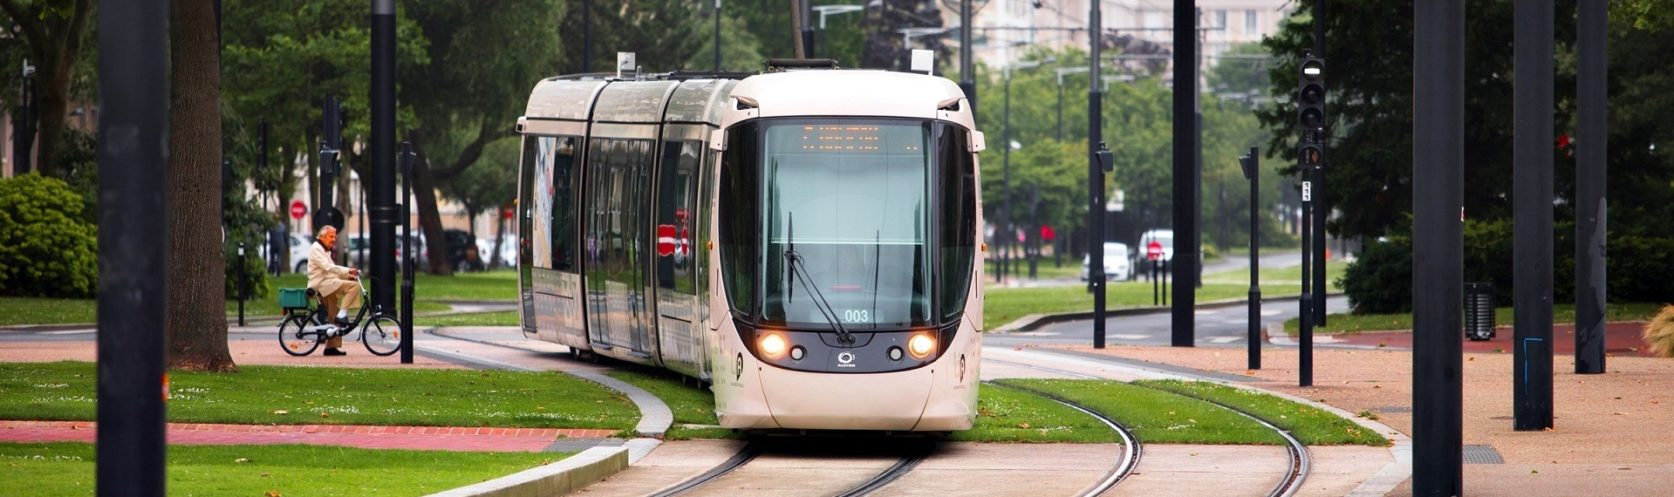 transdev mobility company transport public commun tramway passagers le havre lia